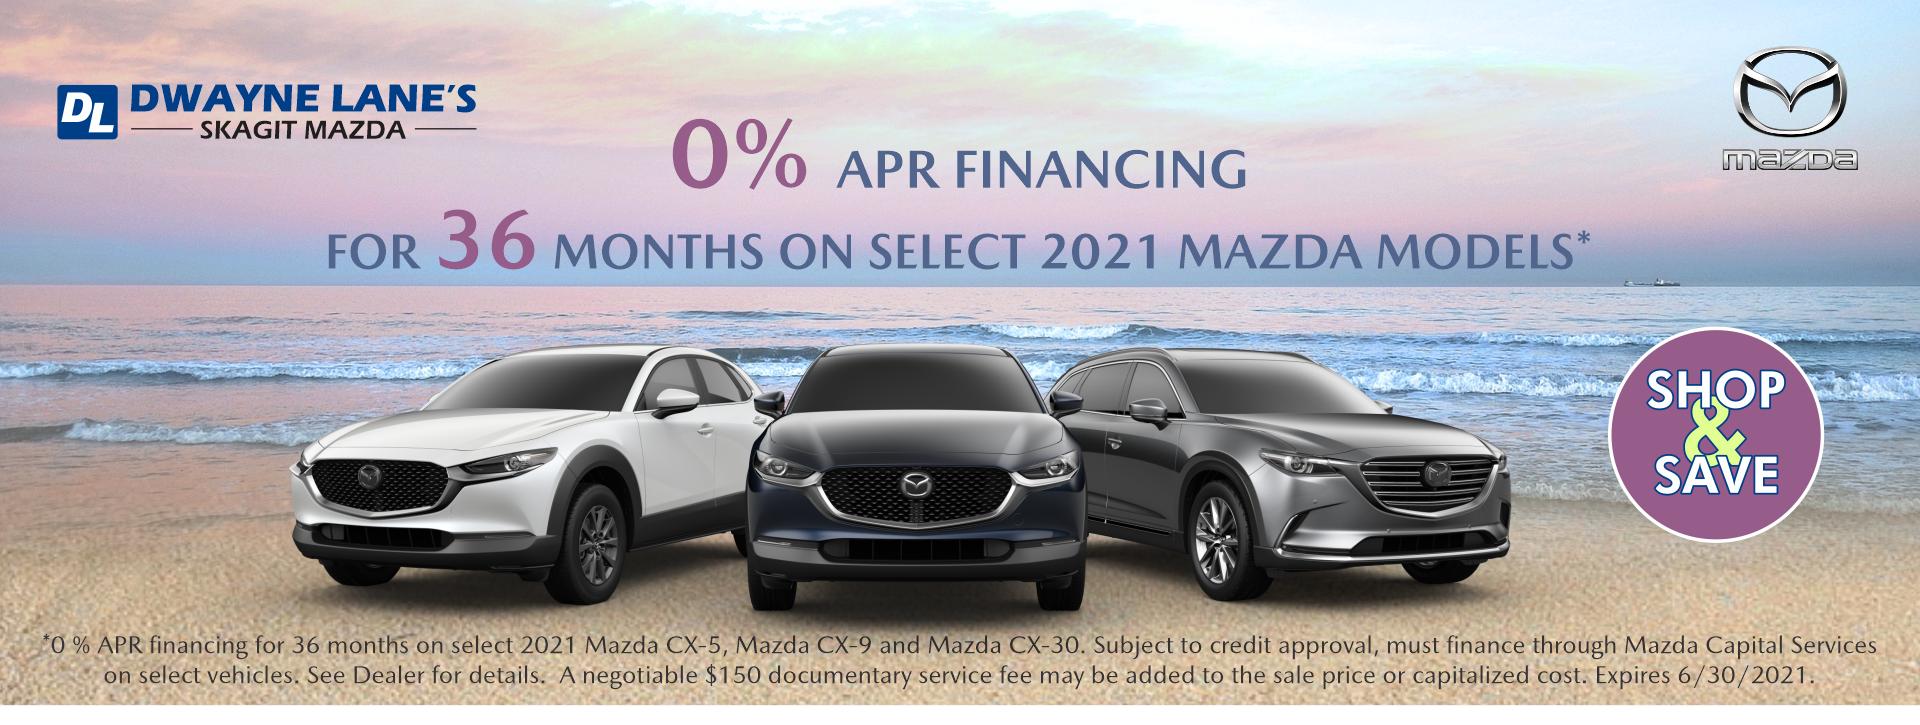 2021JuneBanners-DLAF-Mazda